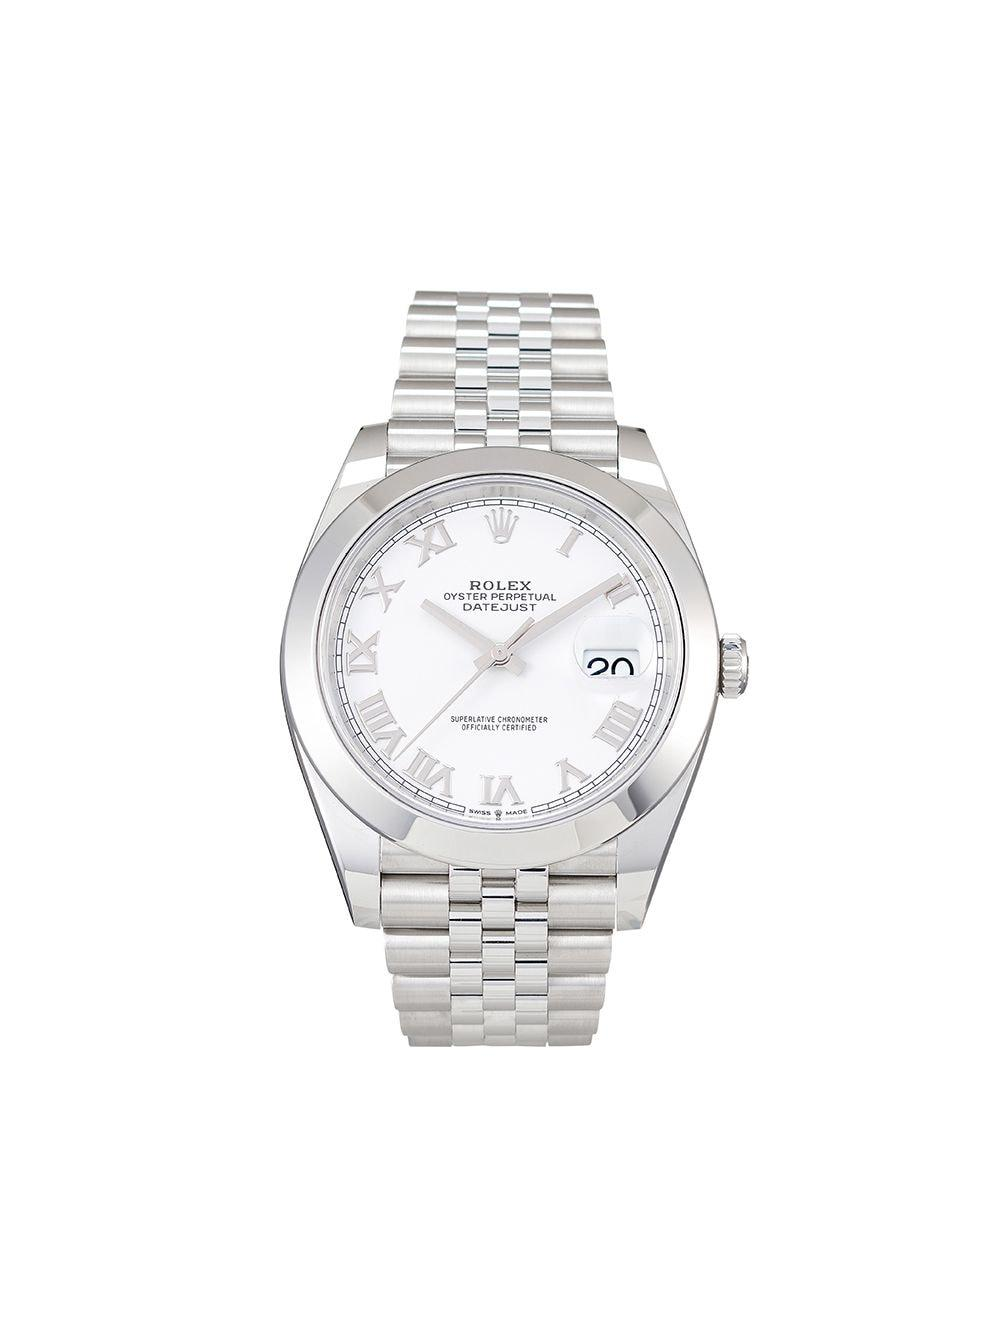 Reloj Oyster Perpetual Datejust de 41mm 2020 sin uso Rolex